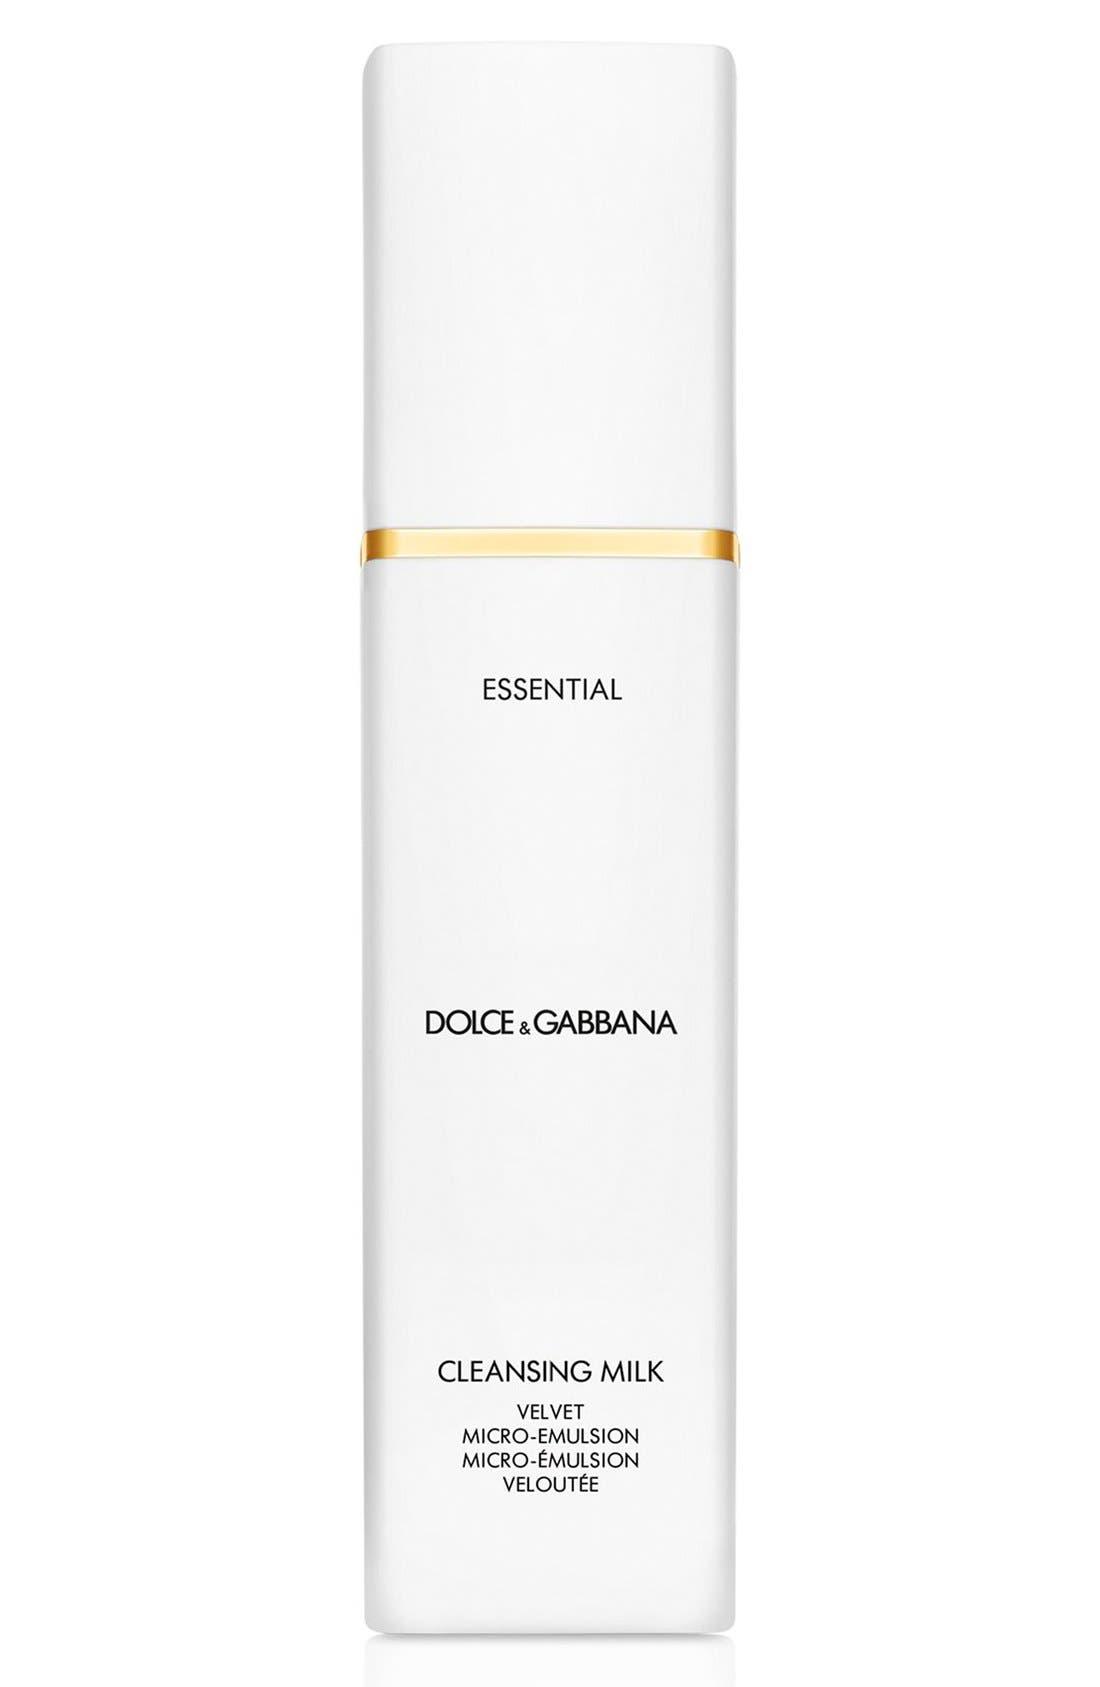 Dolce&GabbanaBeauty 'Essential' Cleansing Milk Velvet Micro-Emulsion